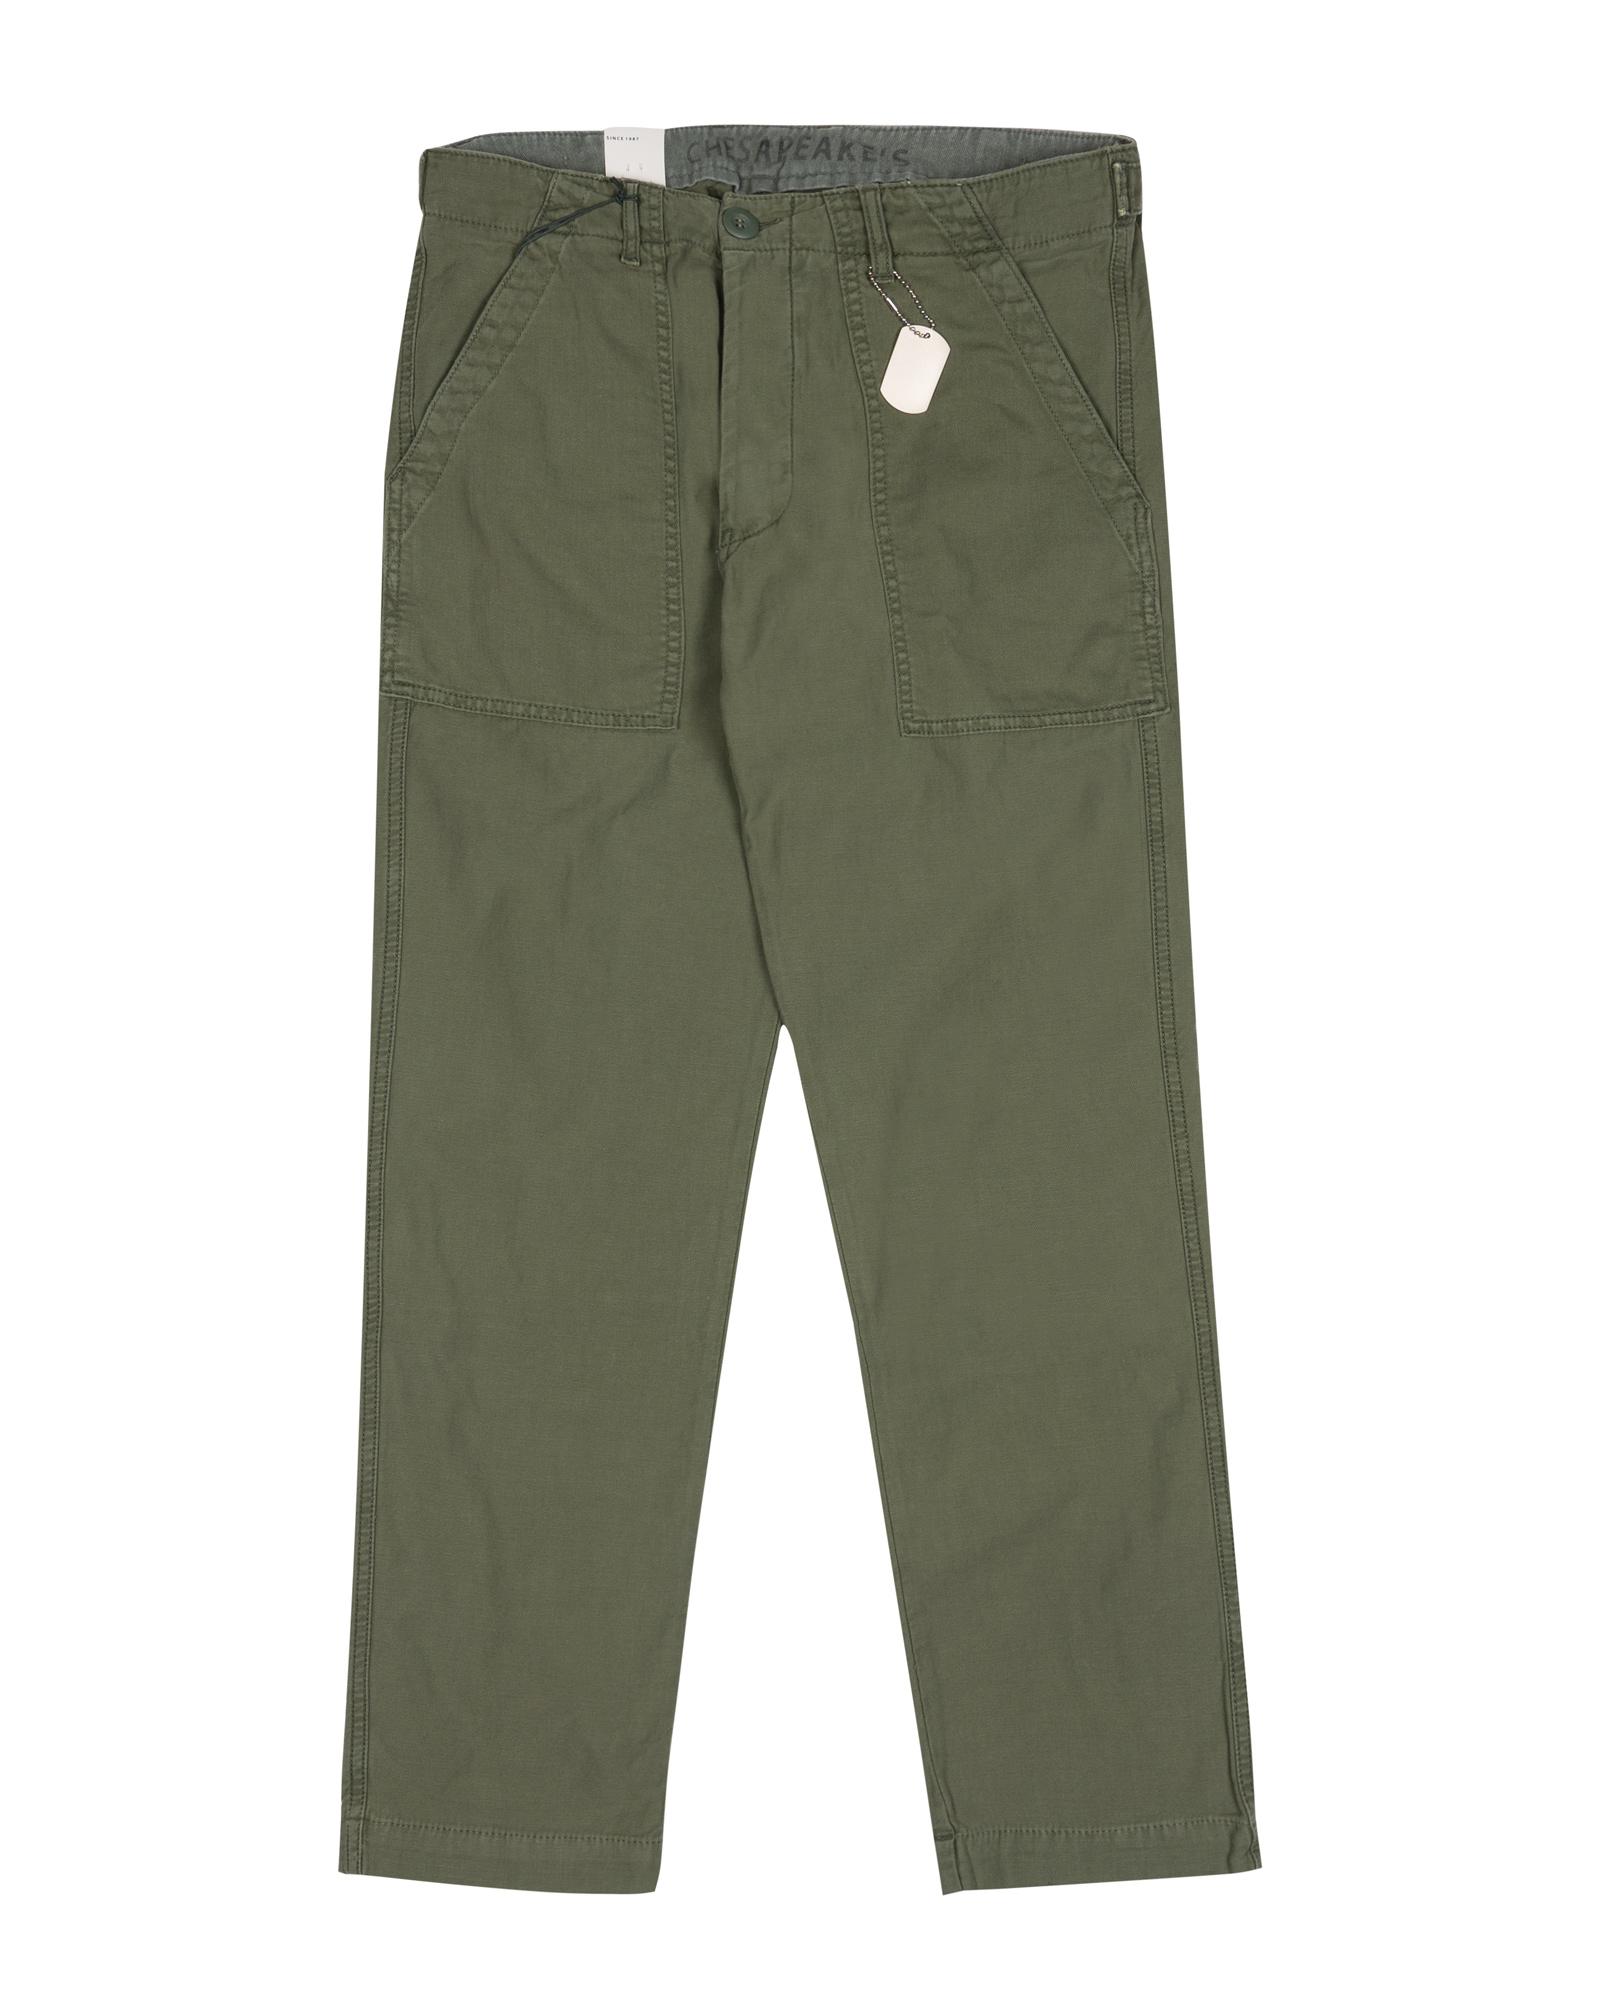 Мужские брюки Chesapeake's DEGRASSE - FATIGUE PANT